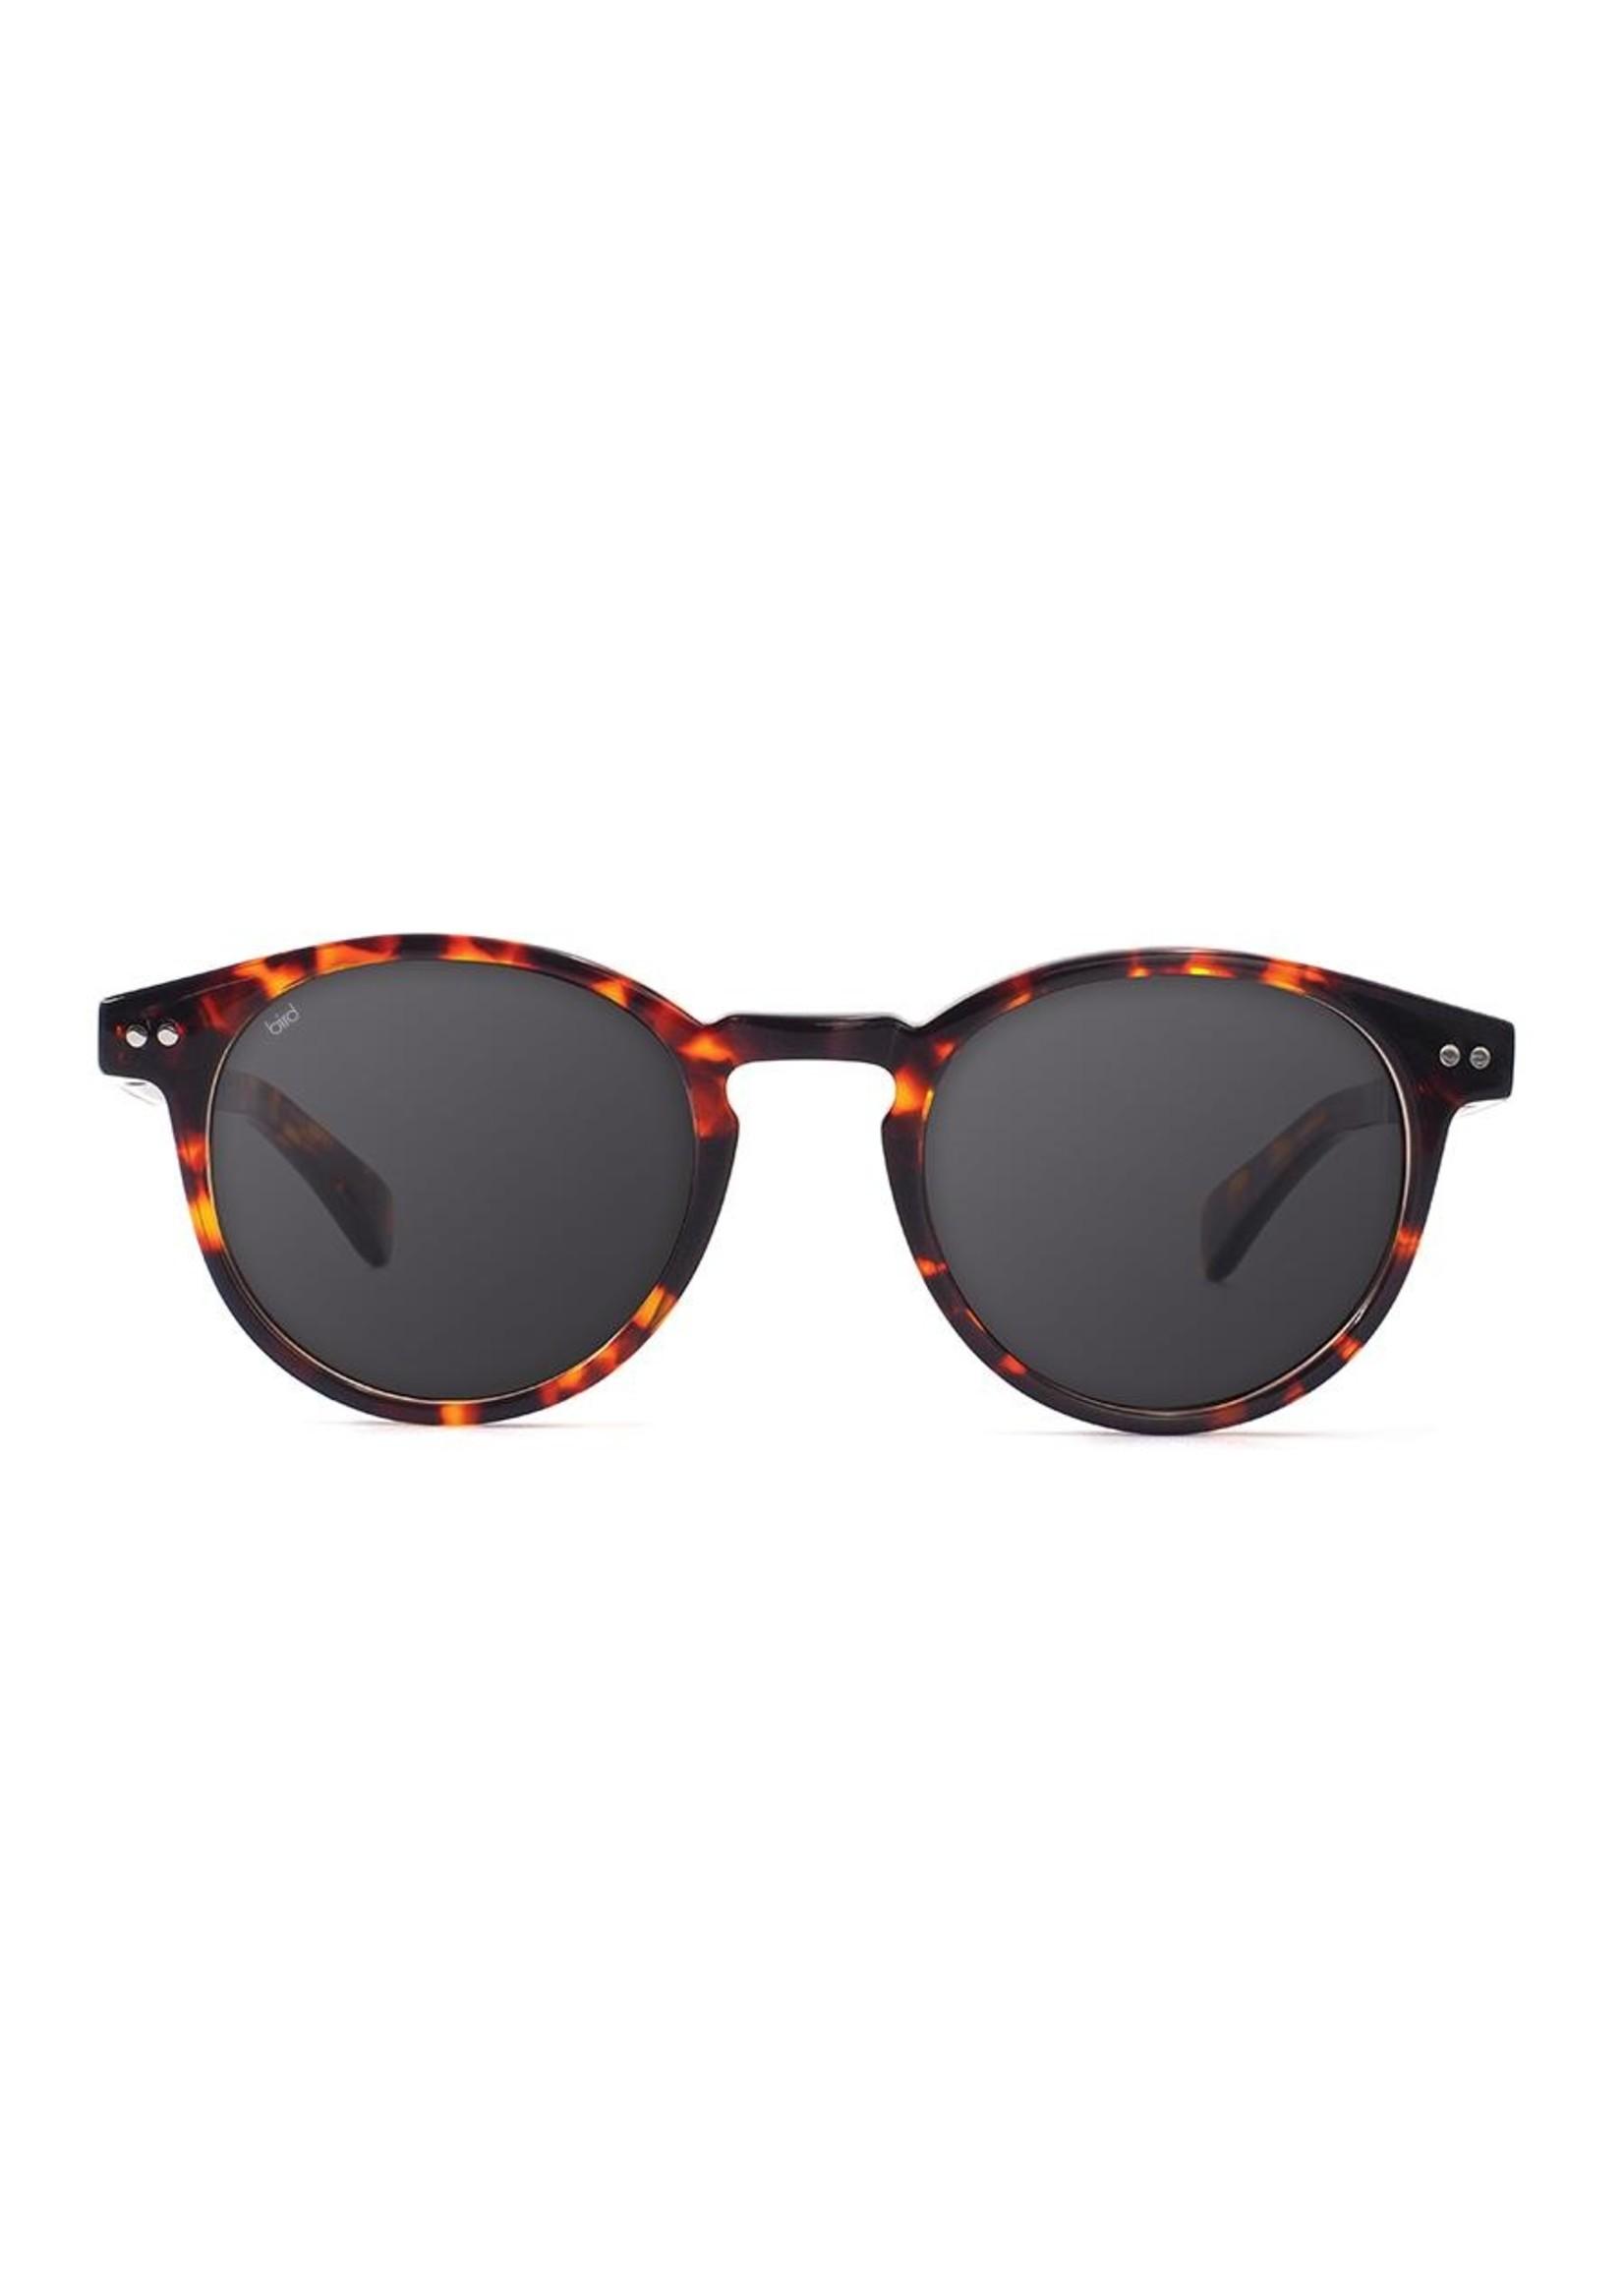 Bird Eyewear Bird Tawny Sunglasses - Tortoiseshell